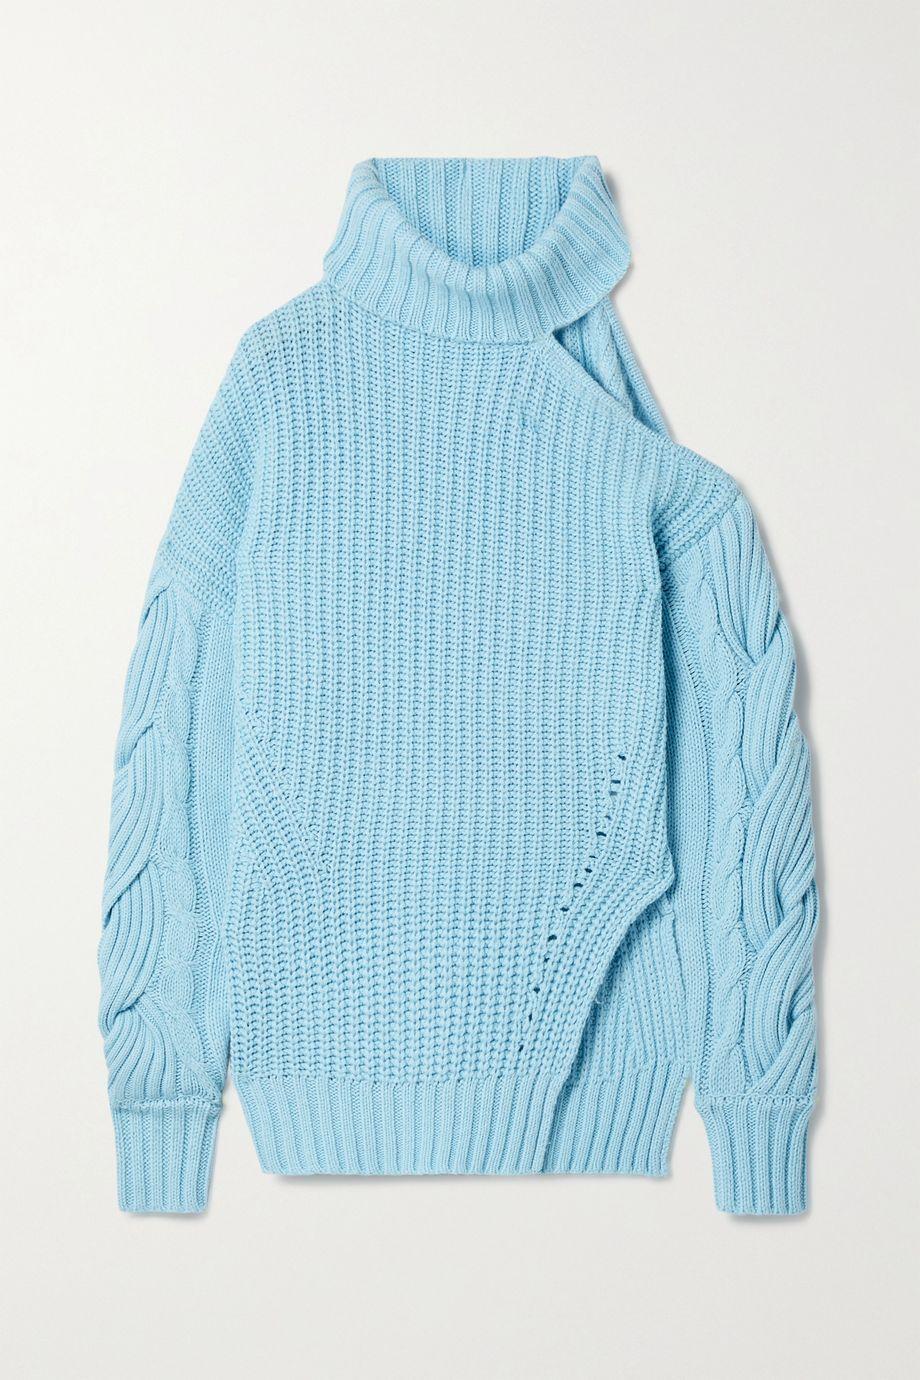 Jonathan Simkhai Aubrey cold-shoulder ribbed-knit turtleneck sweater